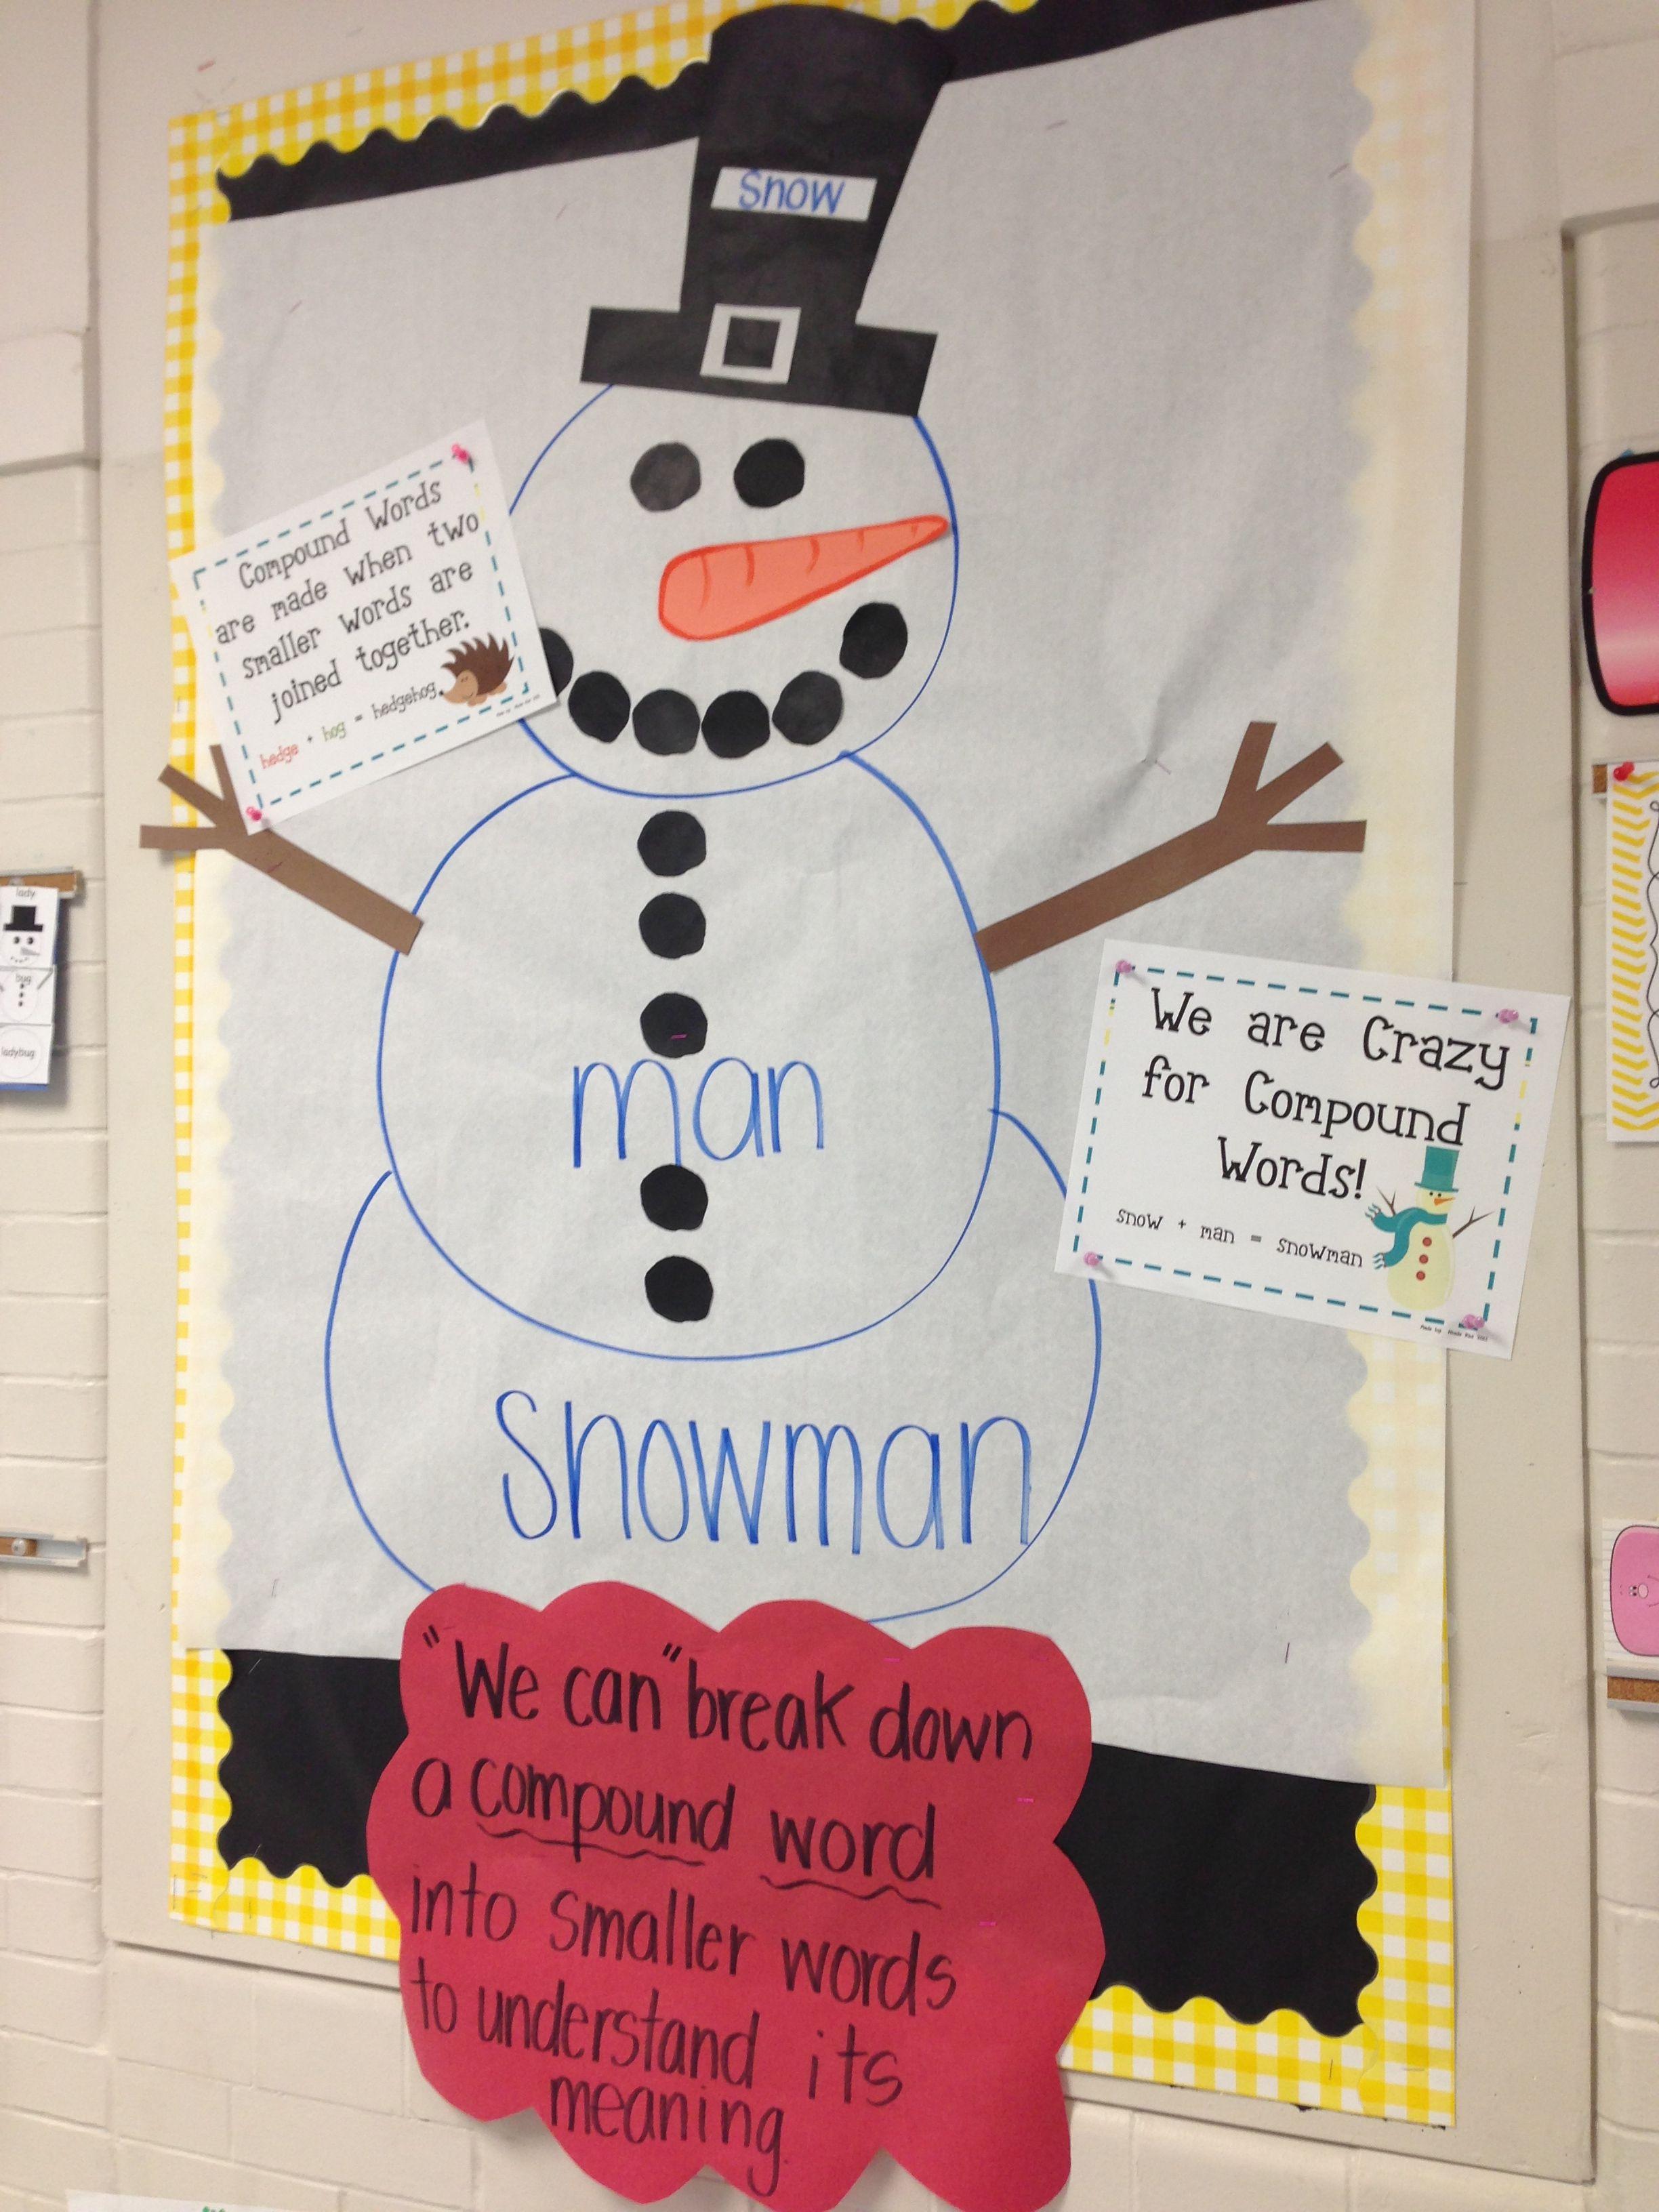 Snowman Compound Words